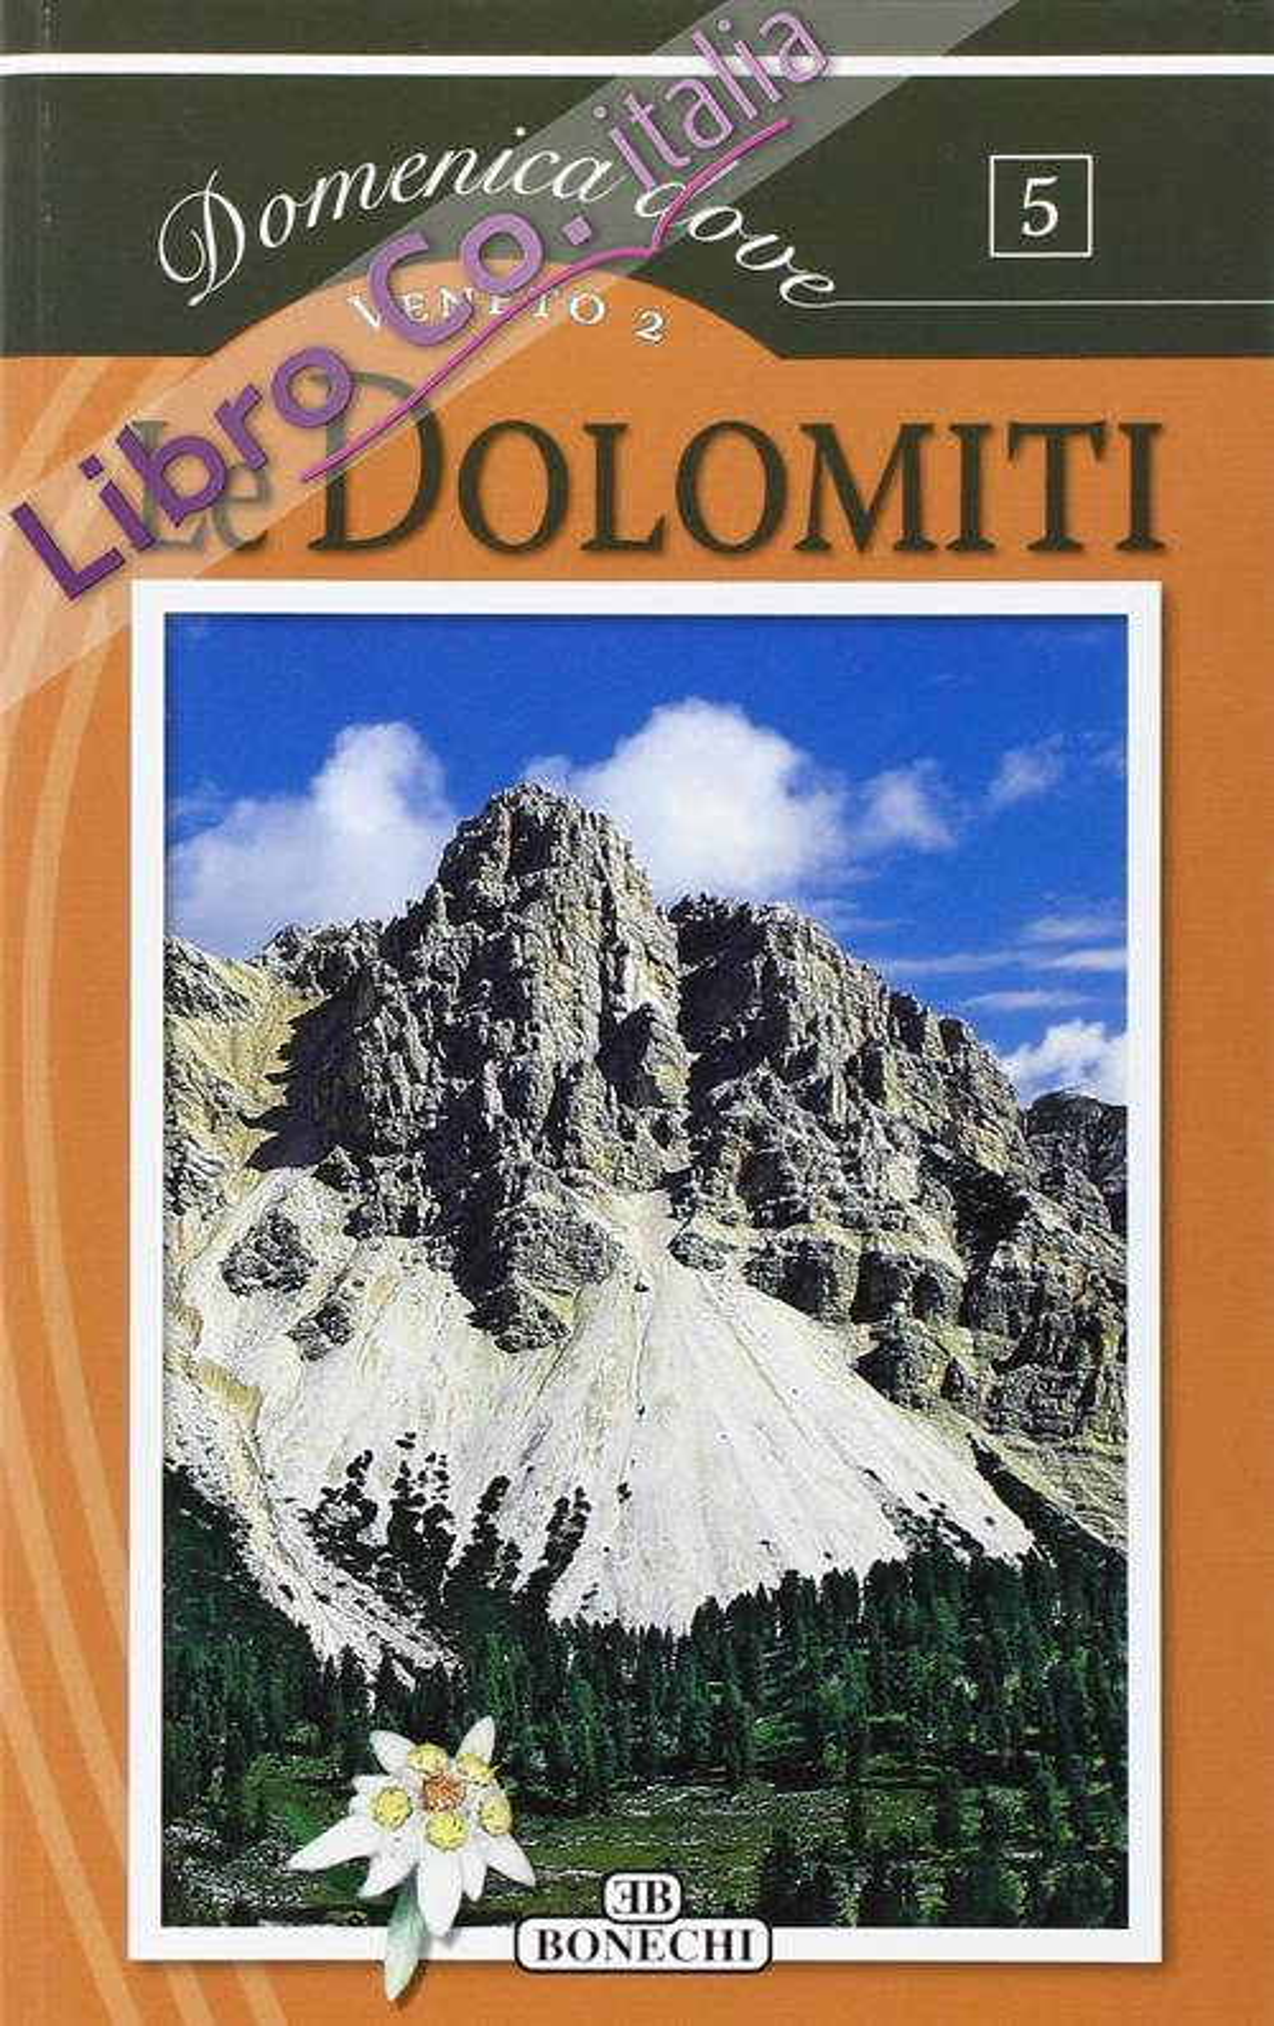 Le Dolomiti. Veneto